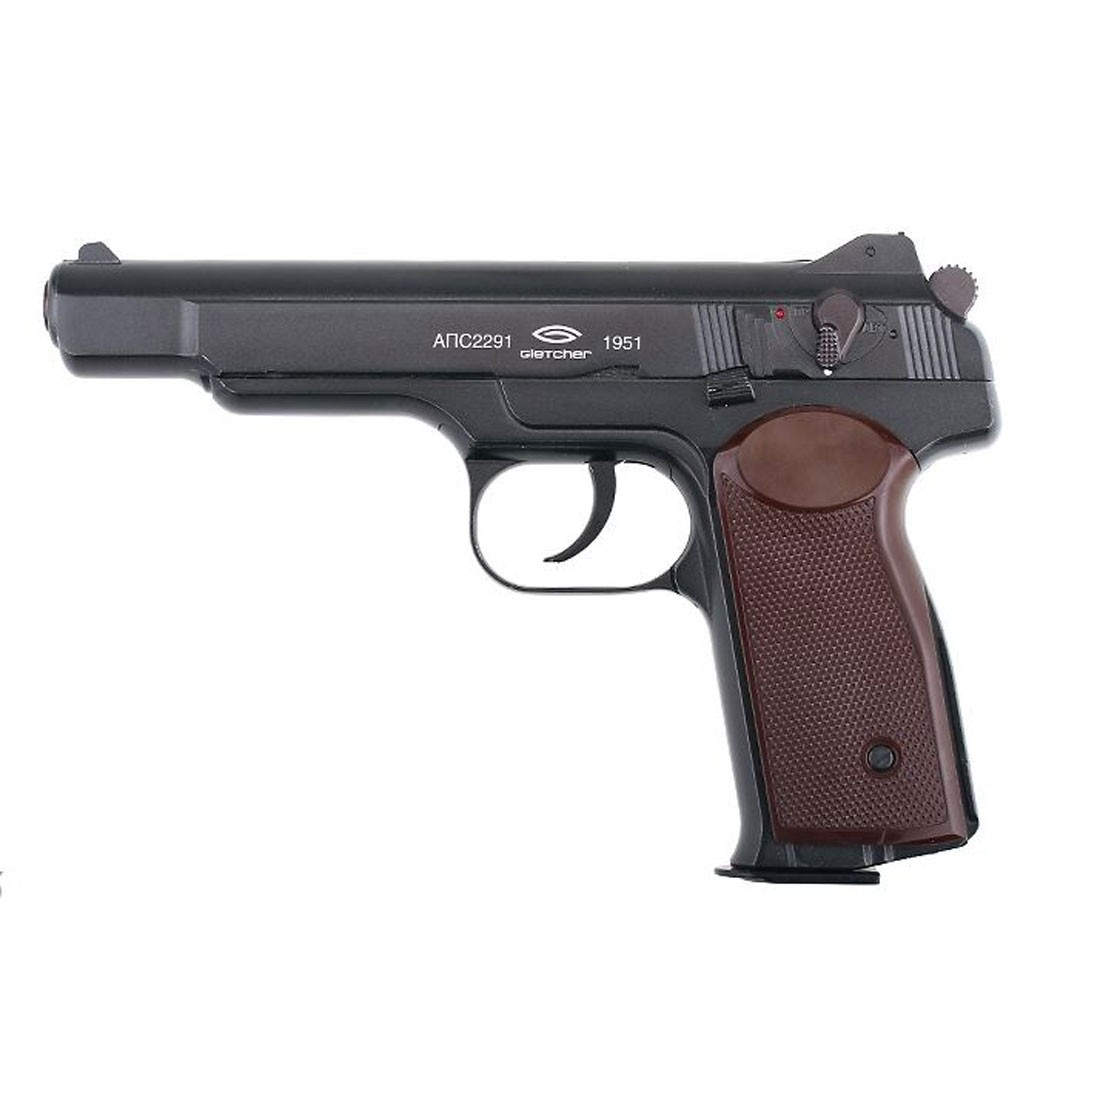 Gletcher APS-A Stechkin CO2 Blowback Airsoft Pistol